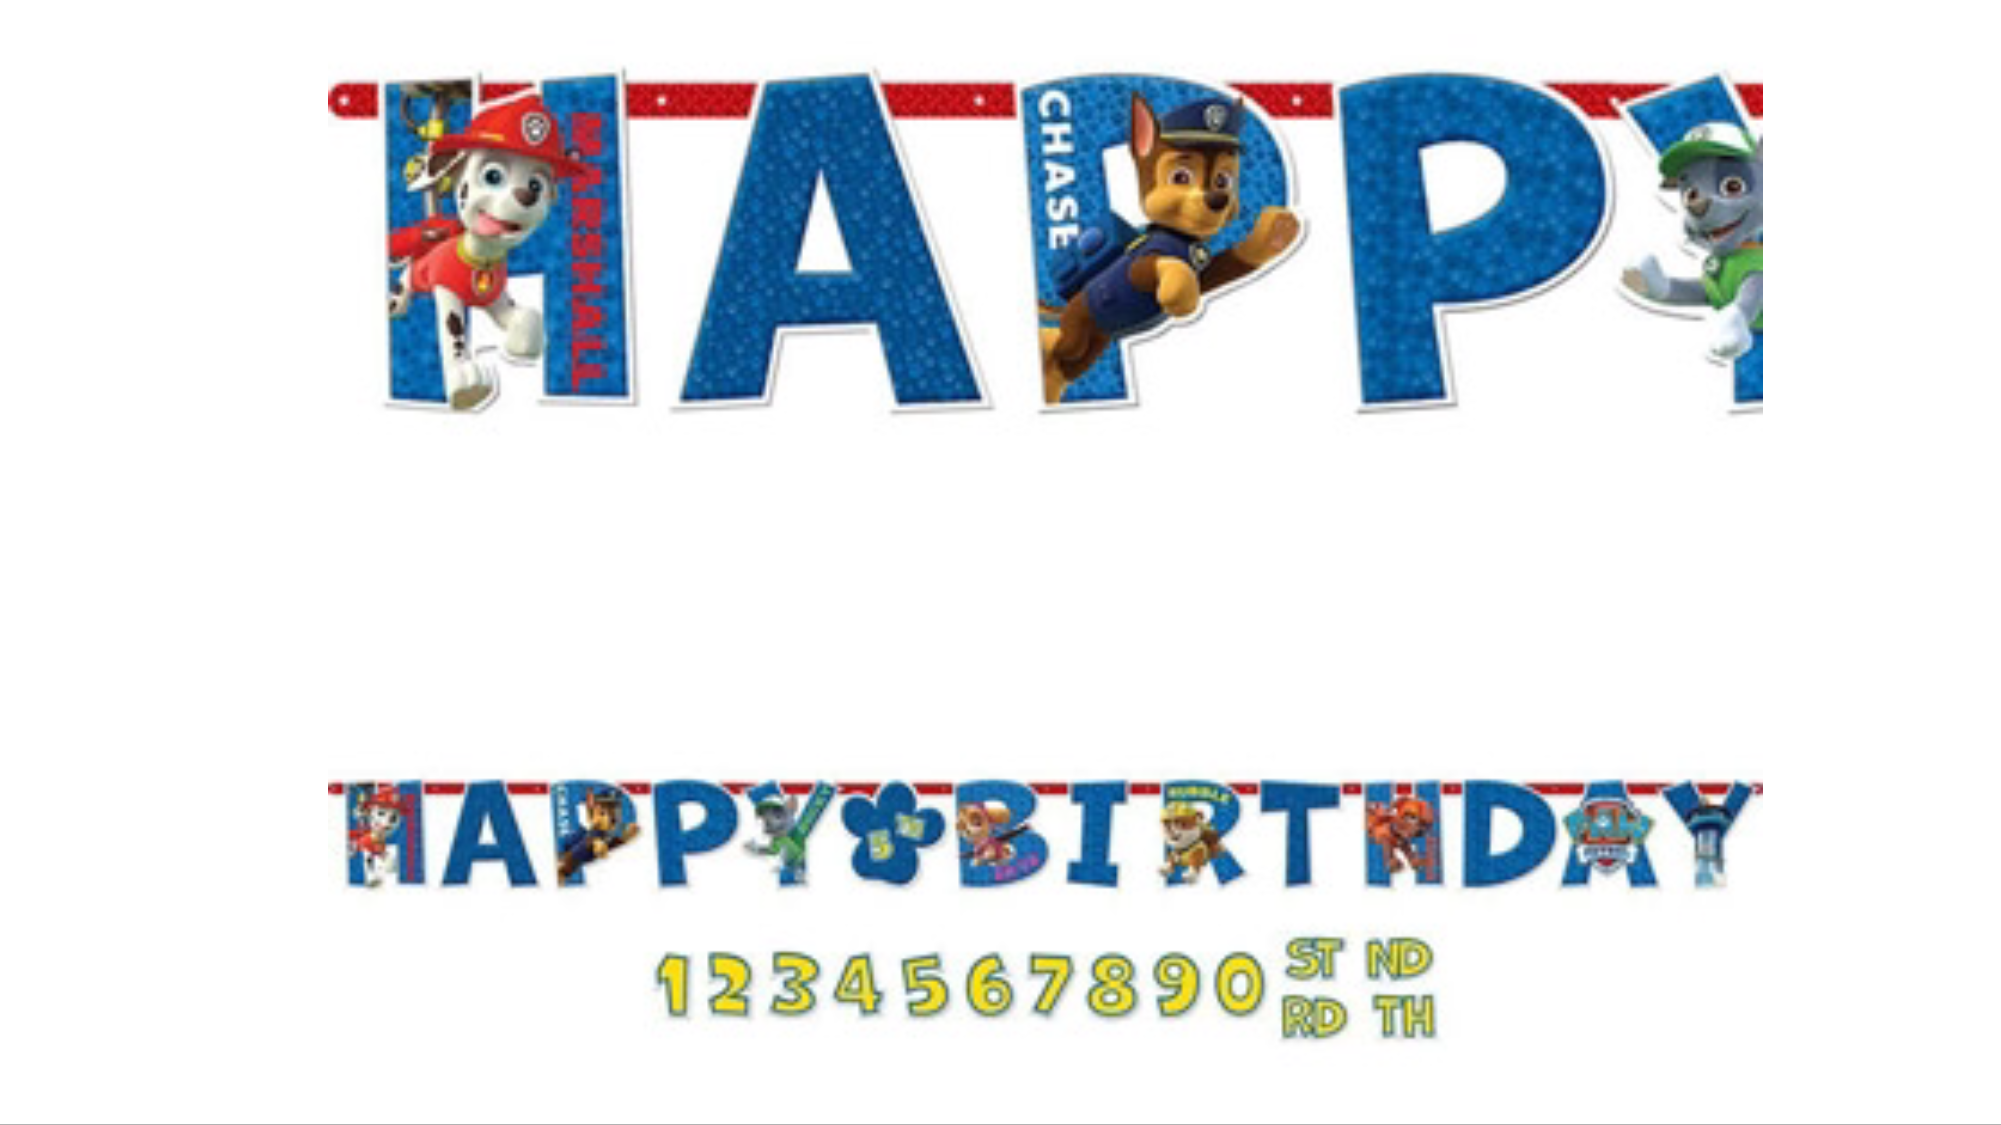 Paw Patrol birthday banner party decoration